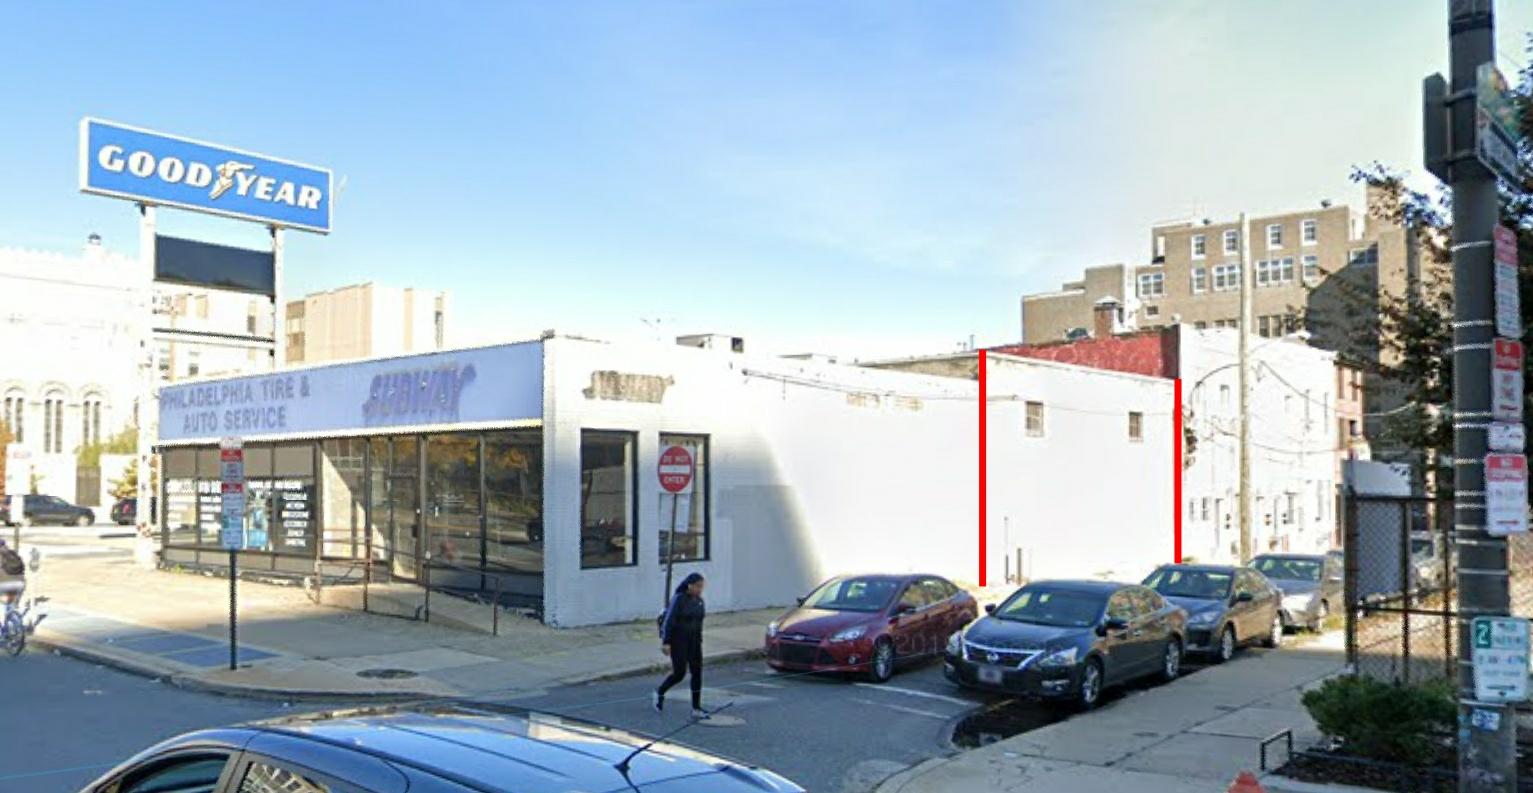 545 North Broad Street via Google Maps